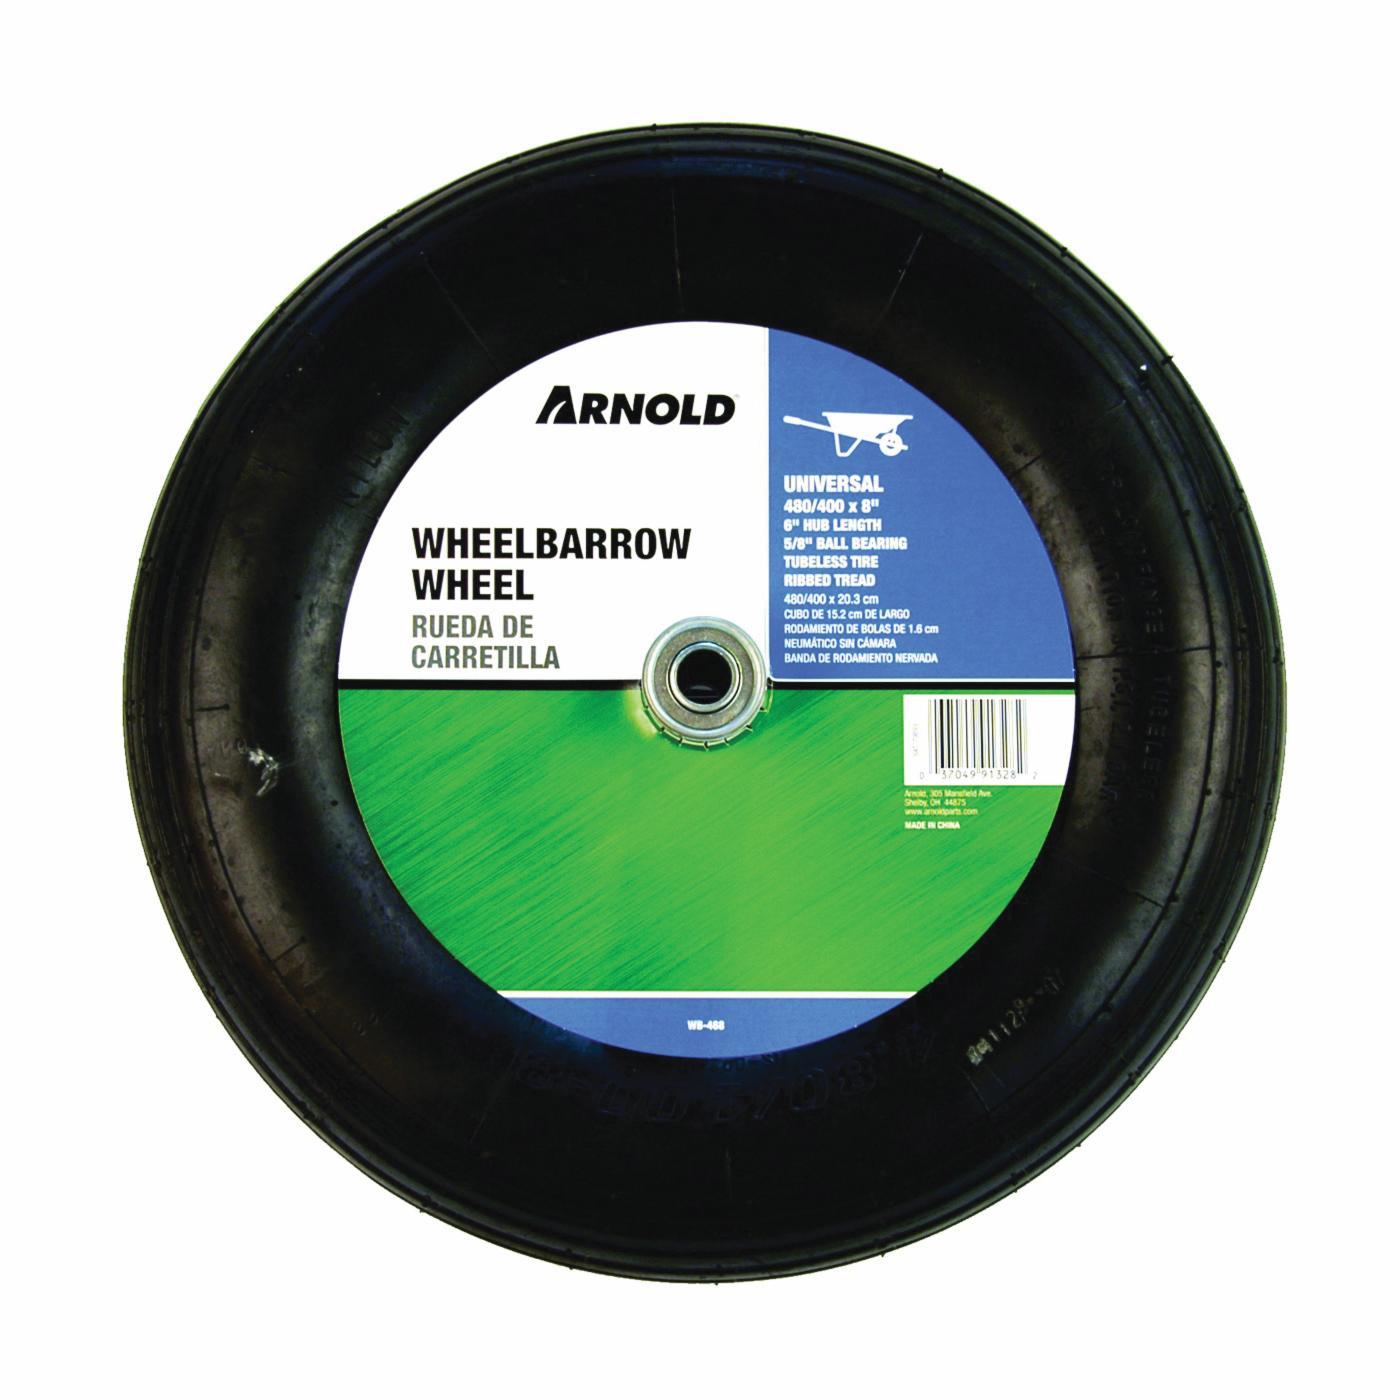 ARNOLD WB-468